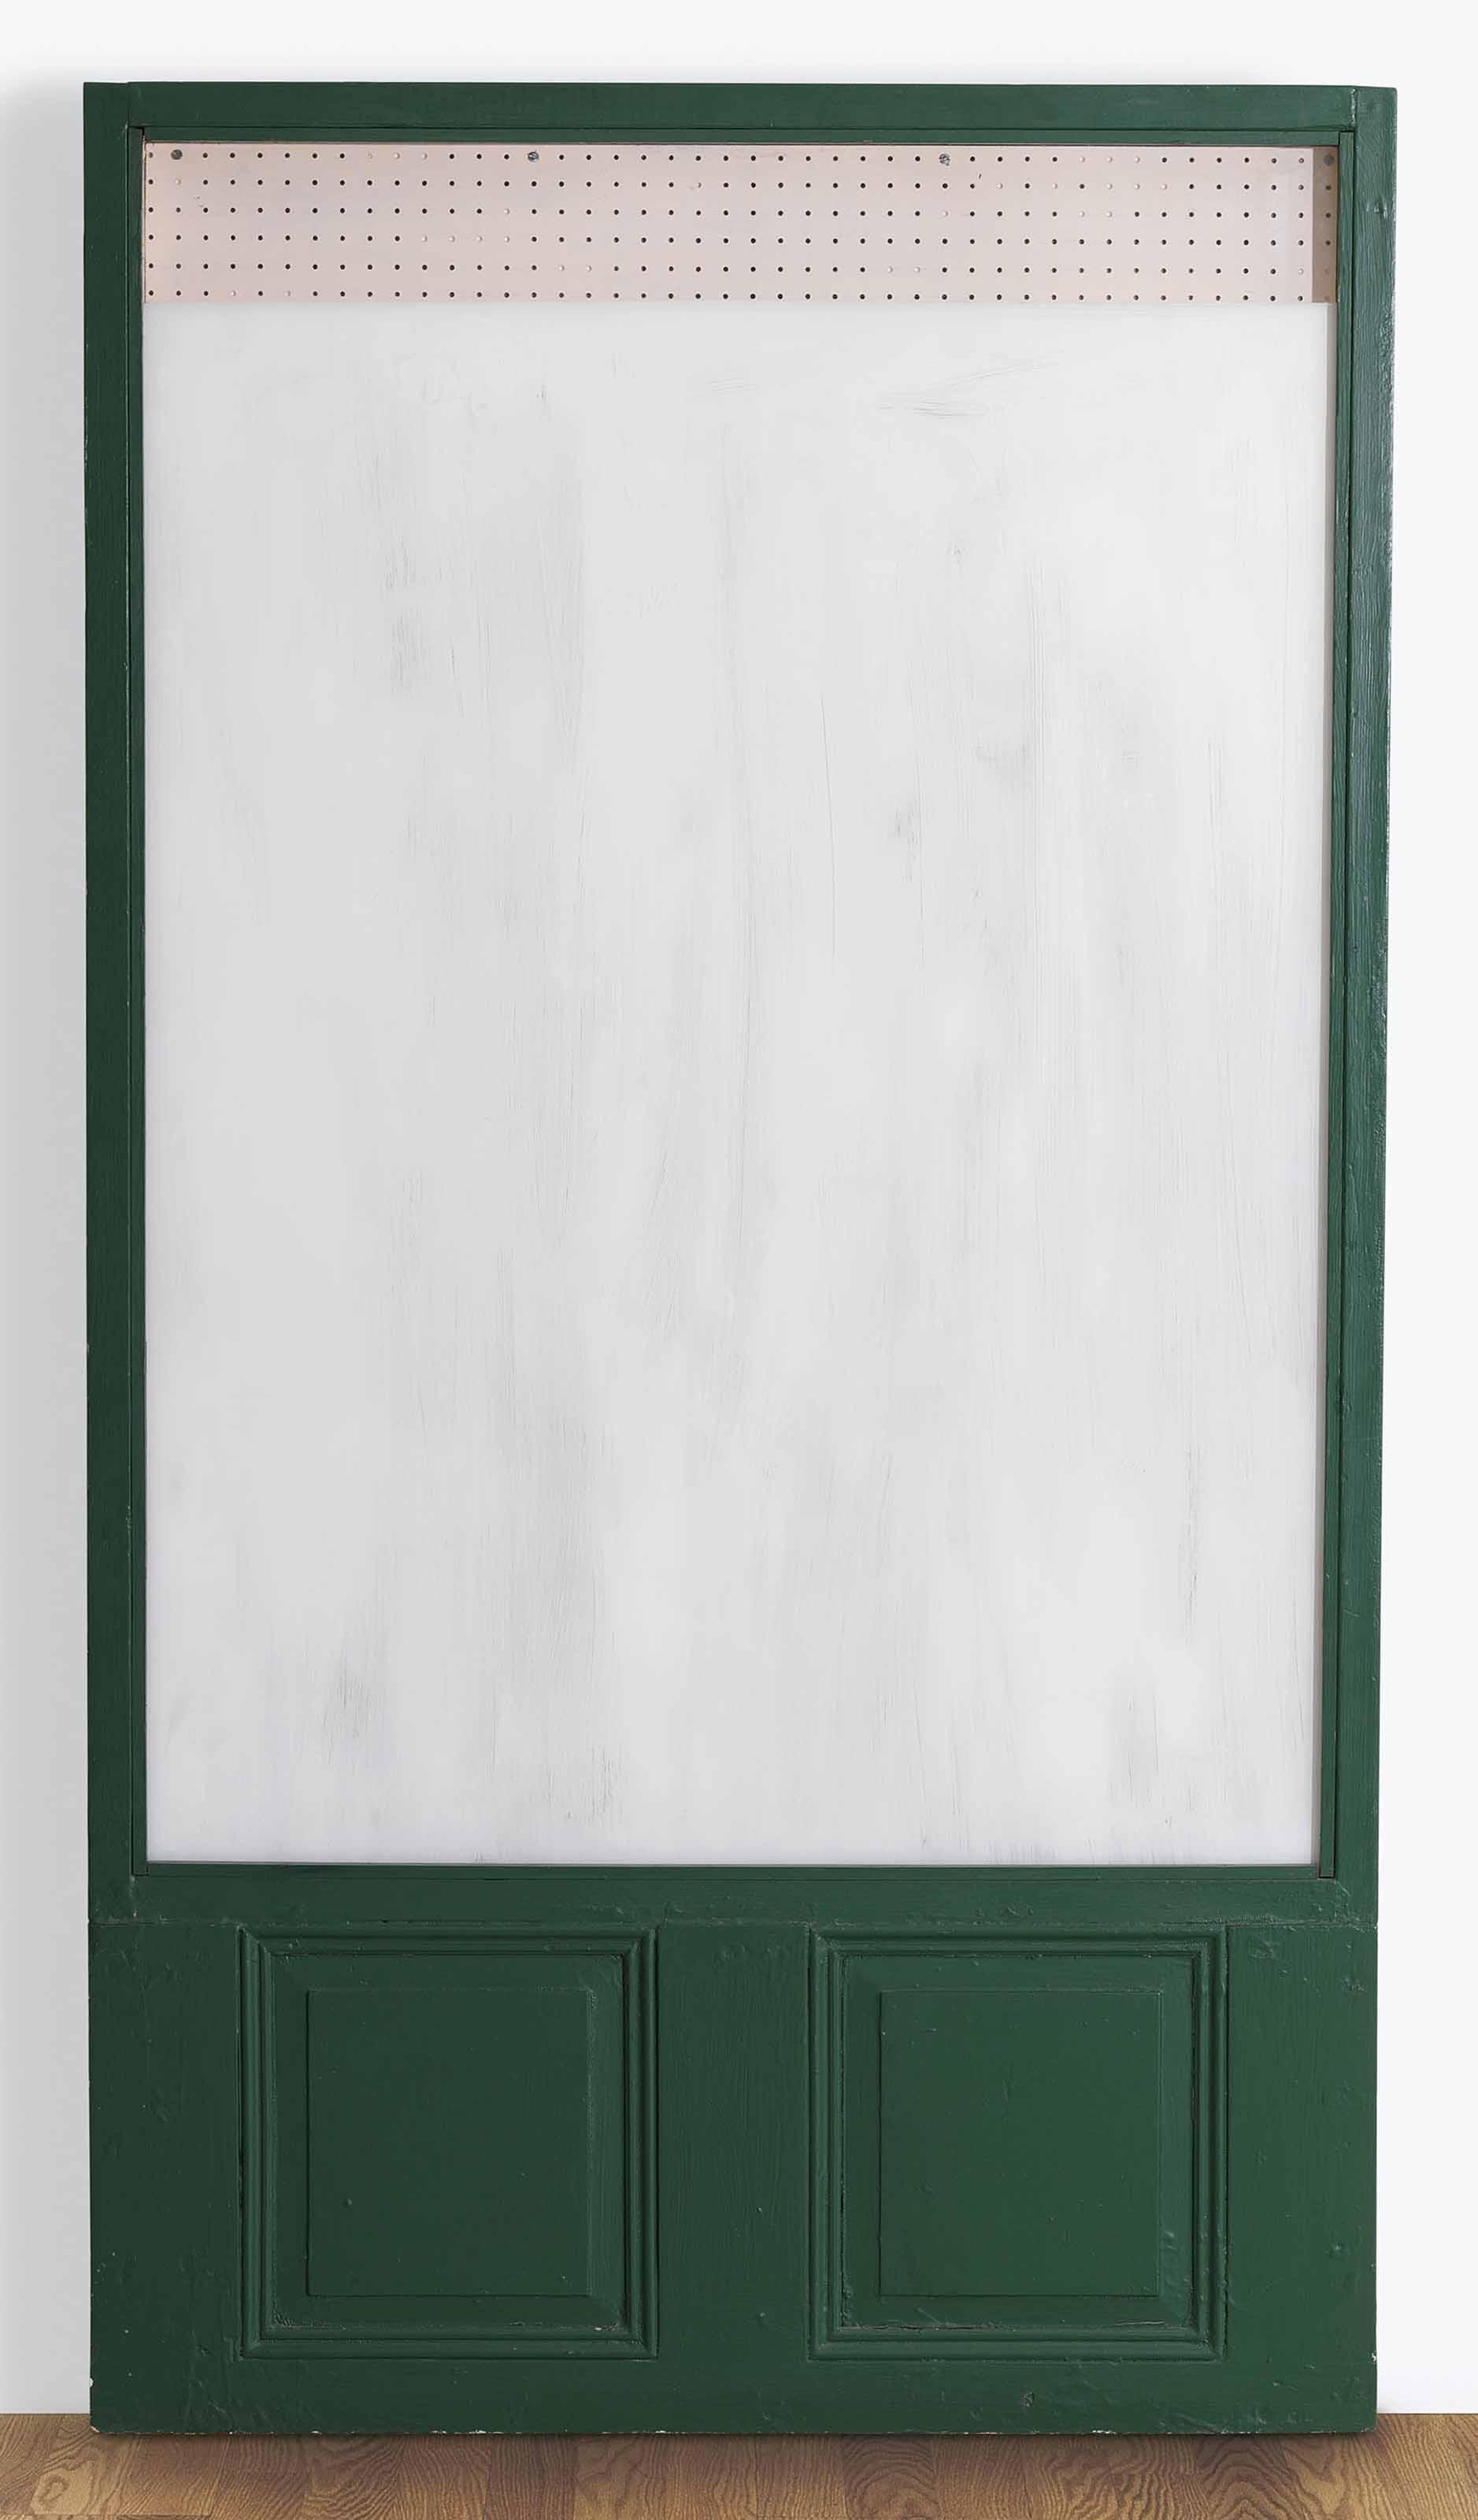 Green Show Window